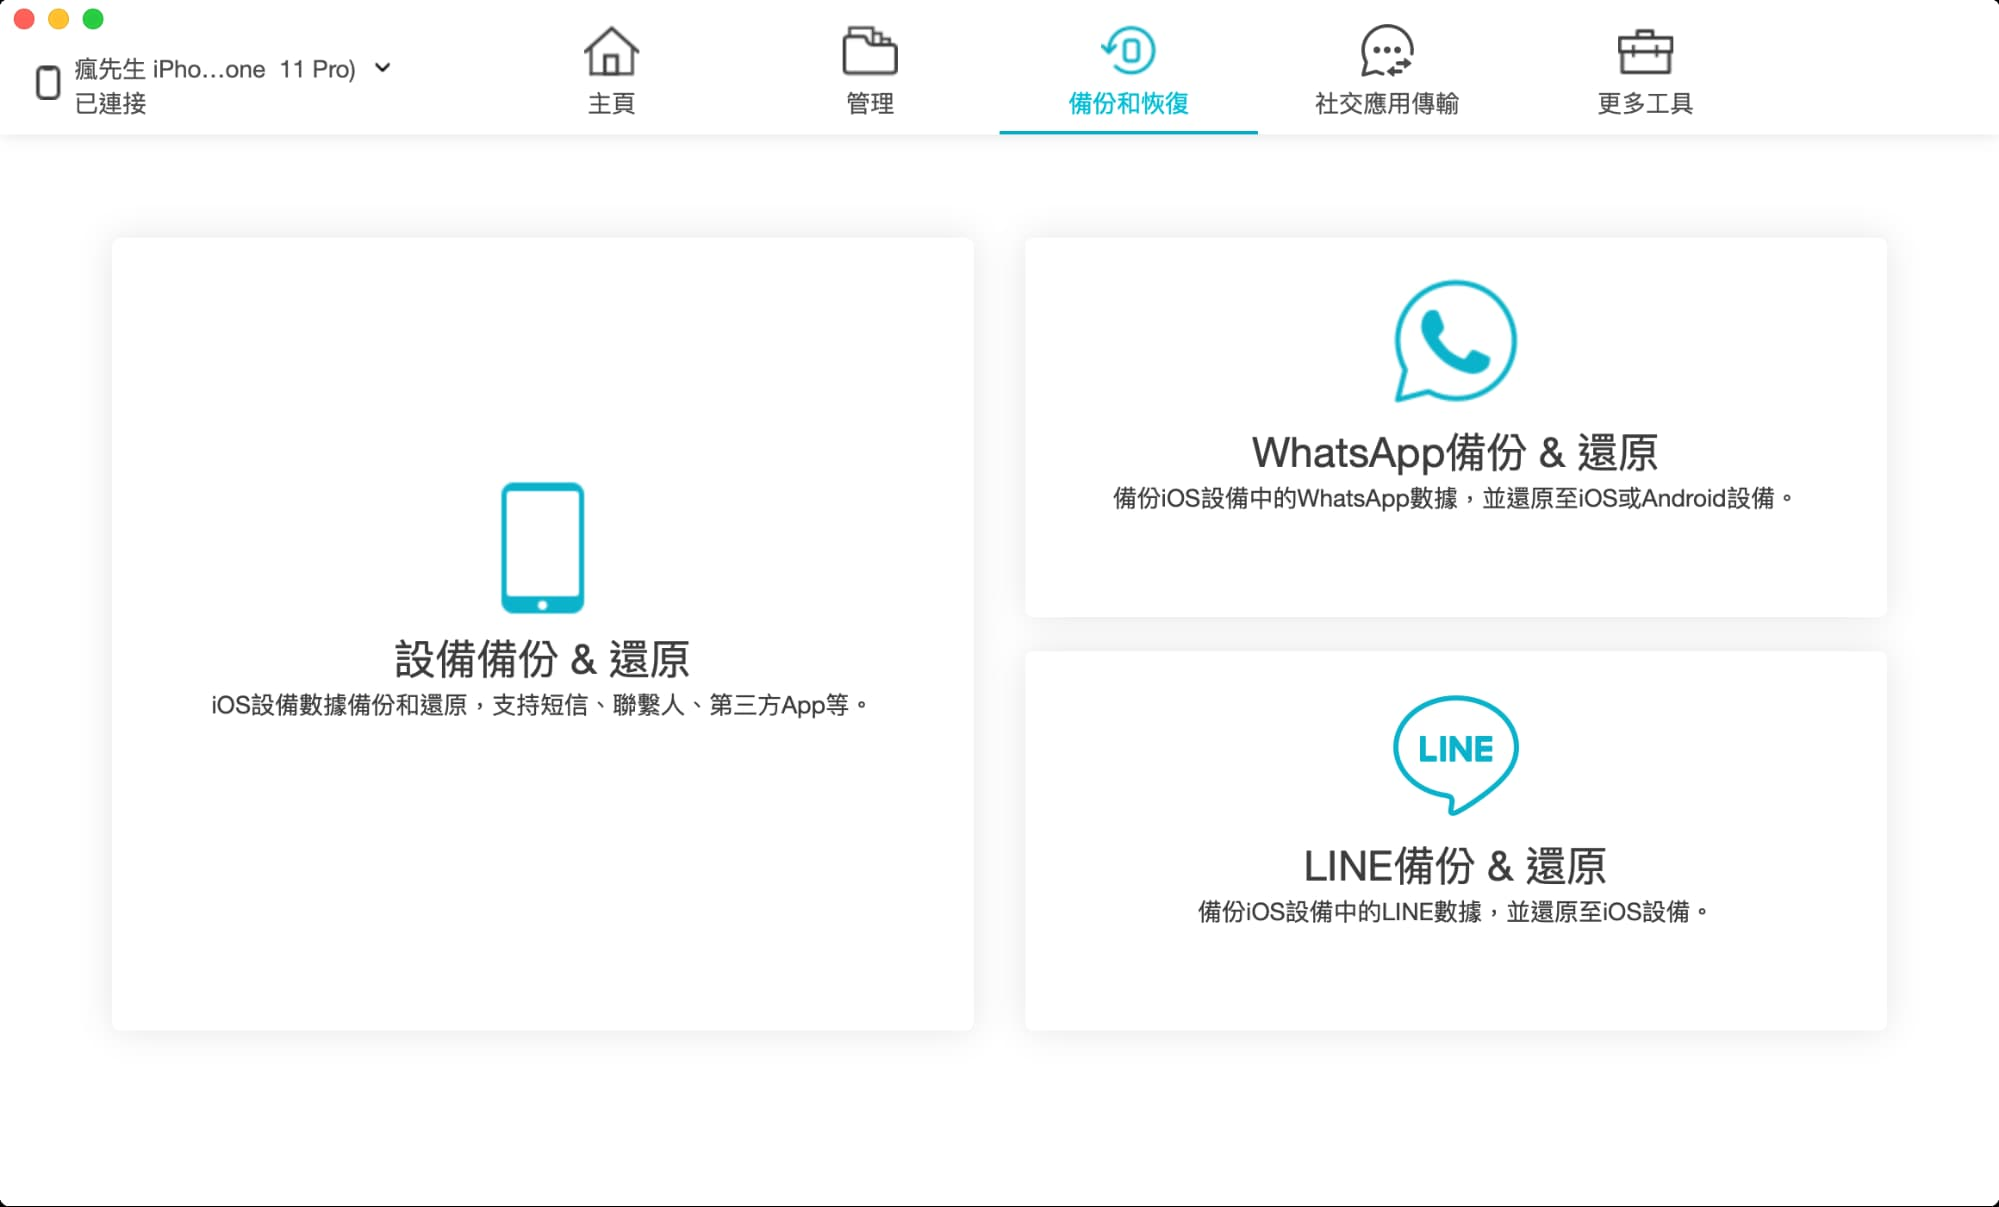 LINE聊天記錄備份轉移 iOS 同步神器 Tenorshare iCareFone